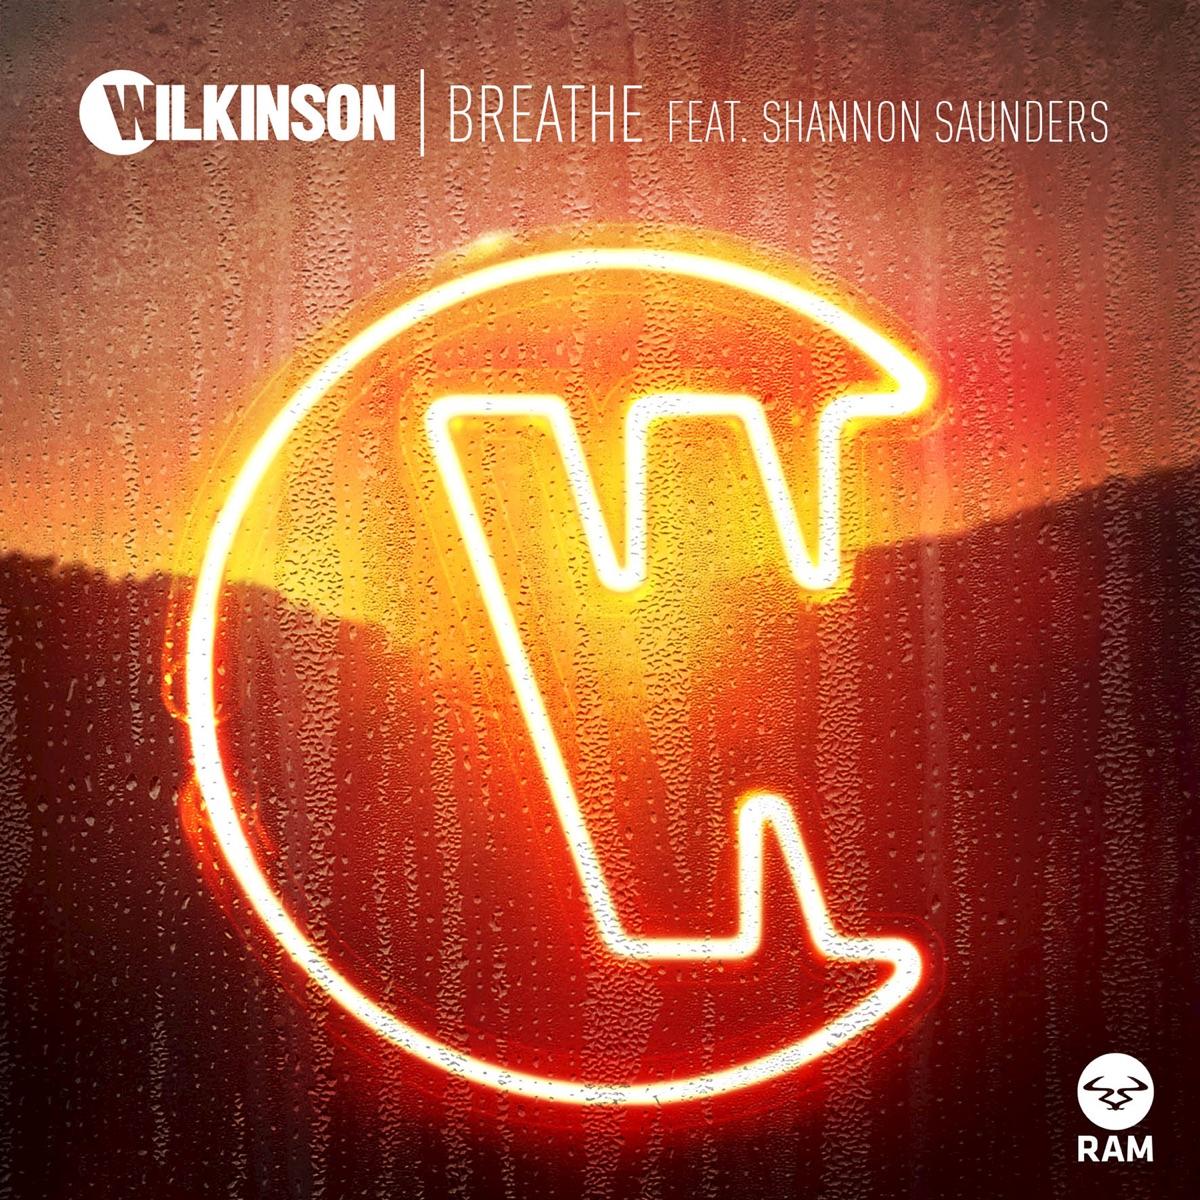 Breathe Album Cover by Wilkinson